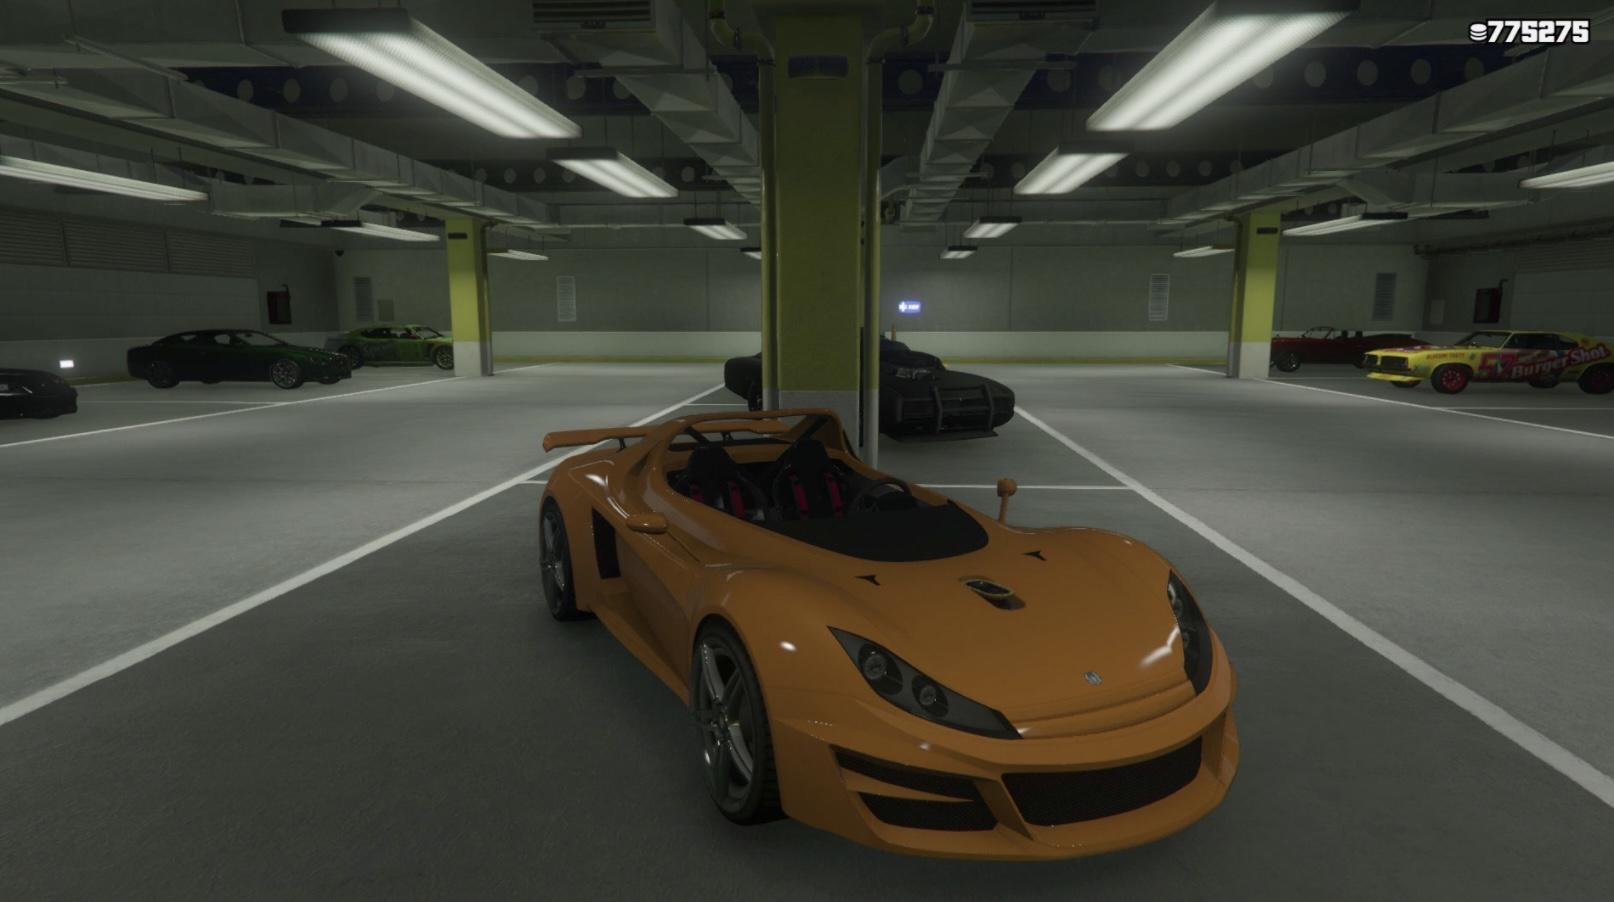 How To Buy Auto Shop GTA 5